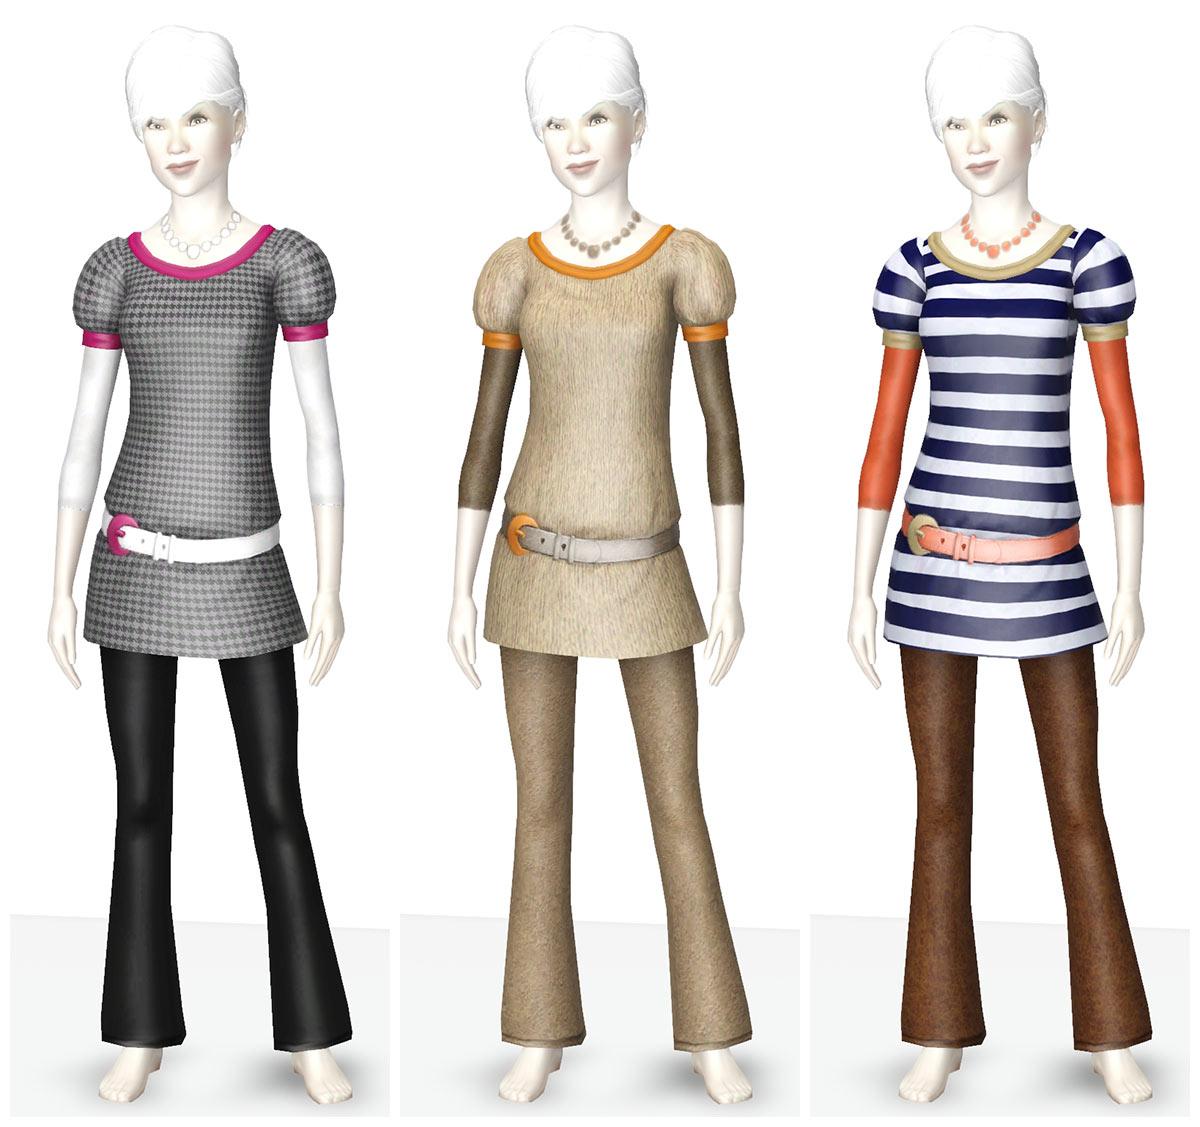 http://parsimonious.org/fashion3/files/k8foutloungedresssslacks.jpg